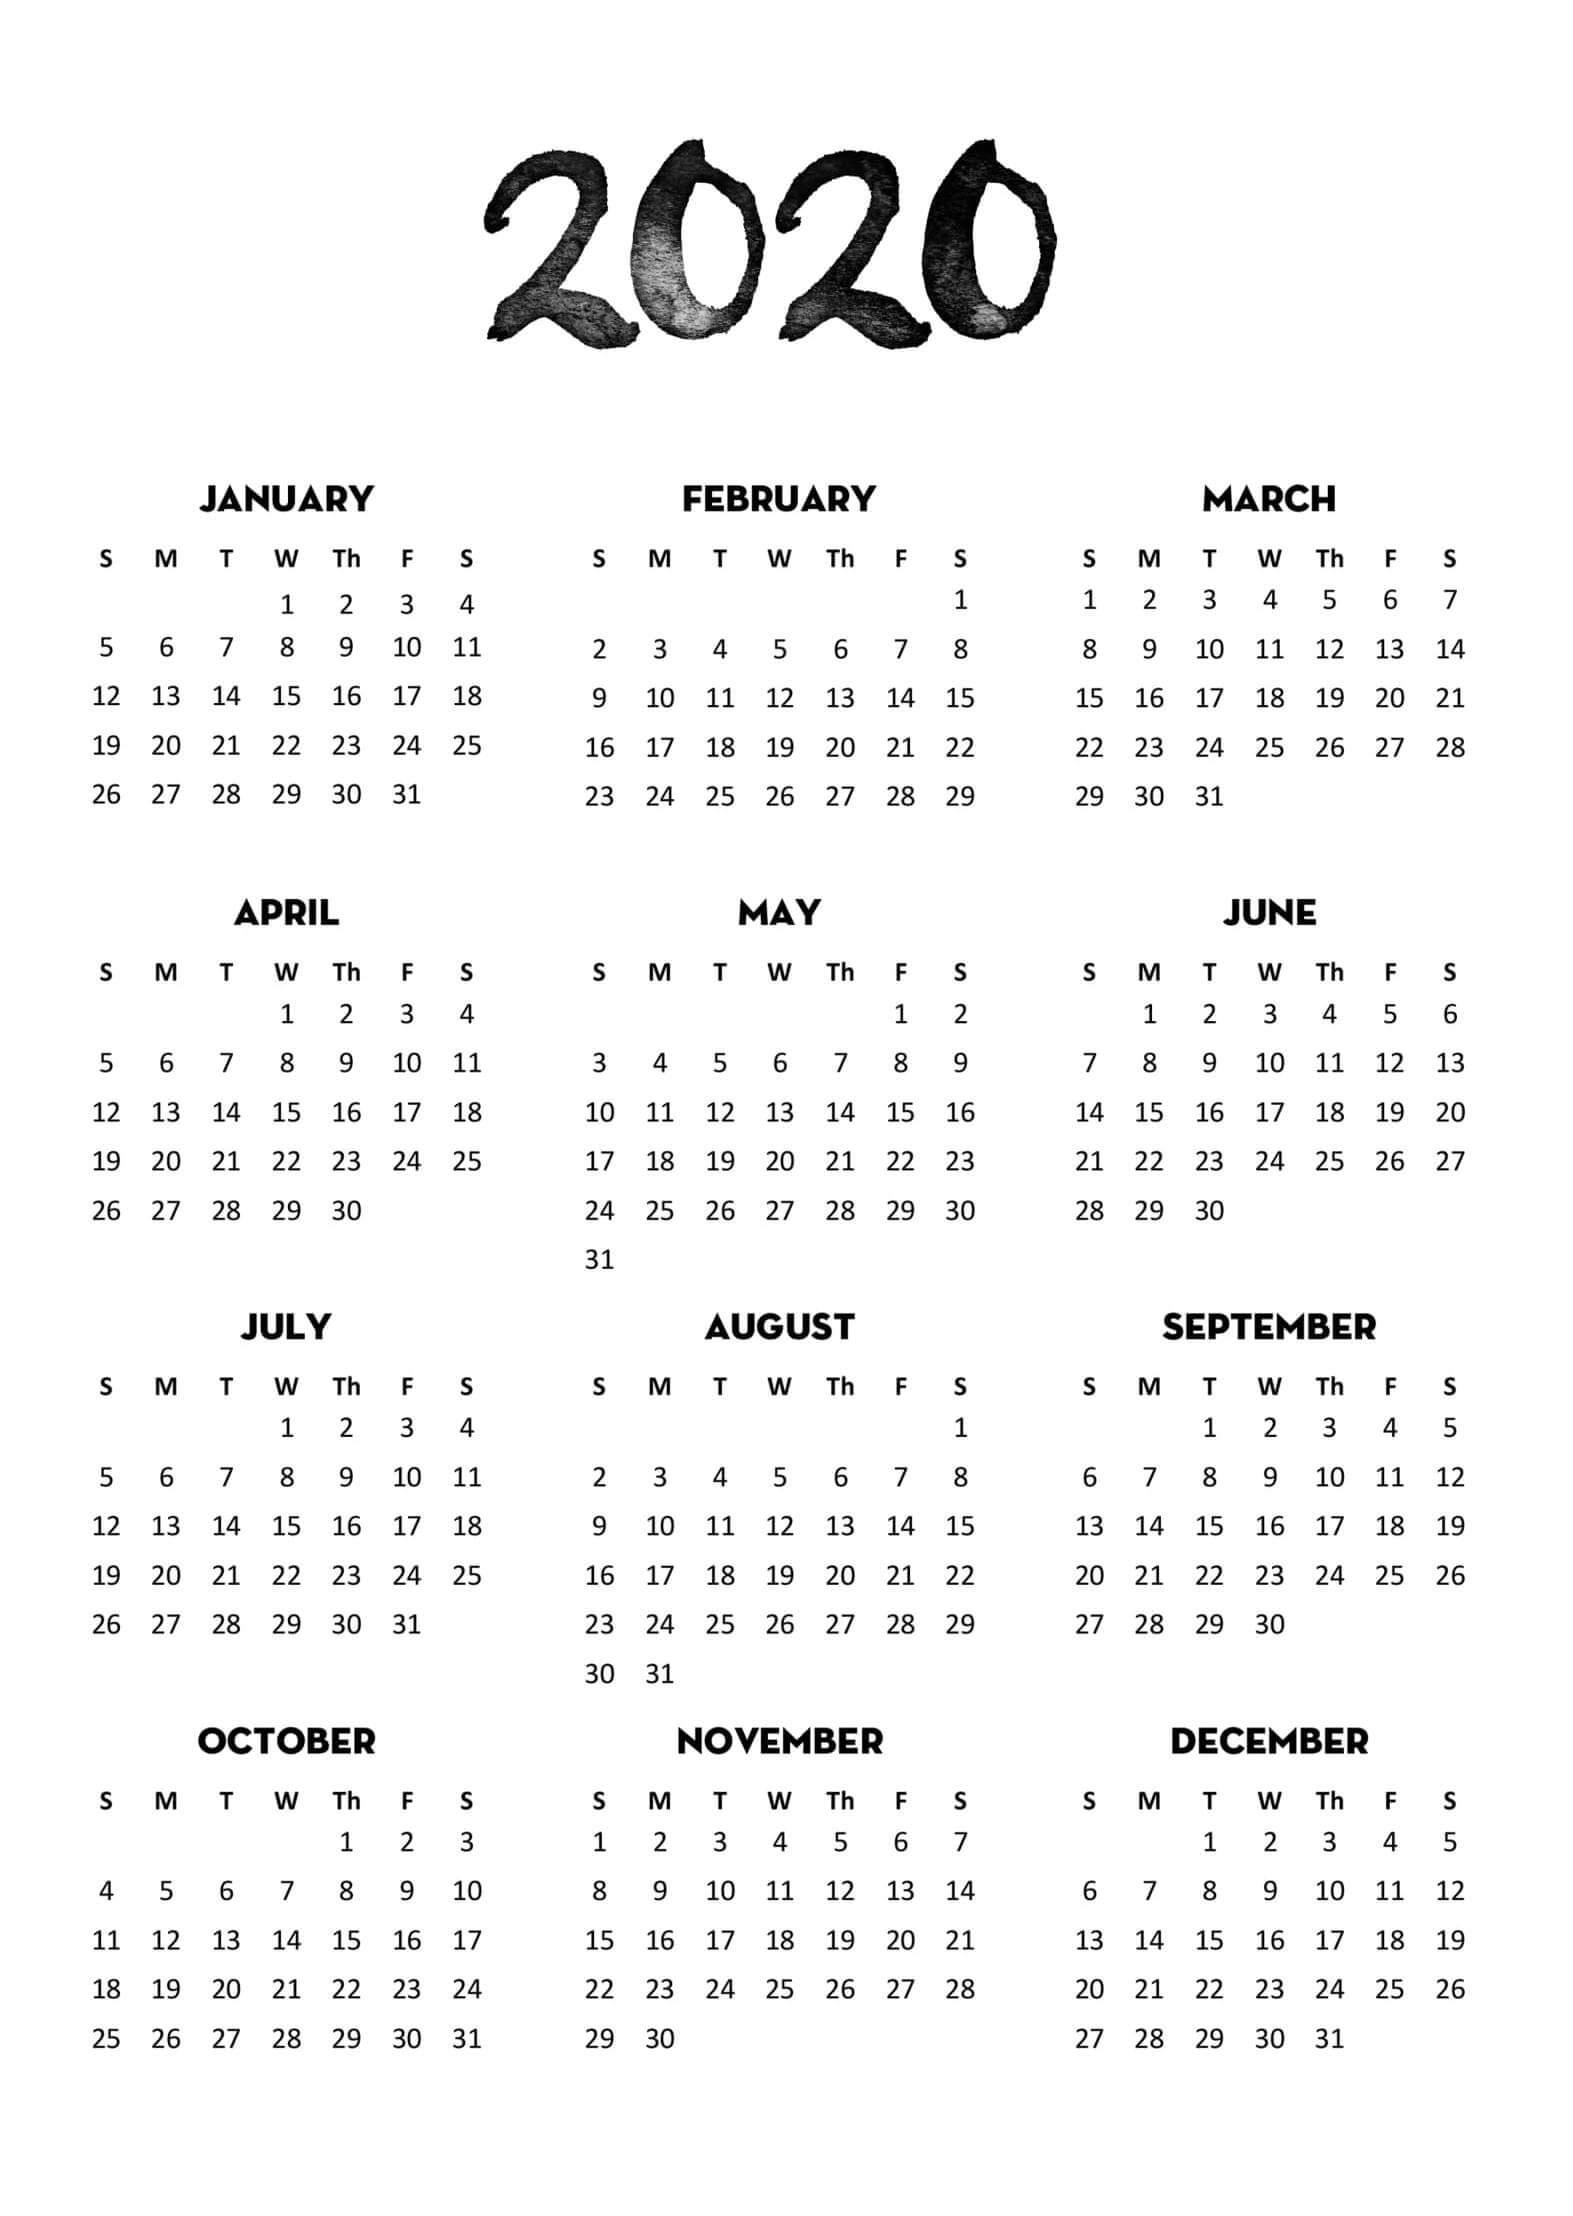 2020 Calendar Full Page - Colona.rsd7 within Year Ata Glance 2020 Calendar